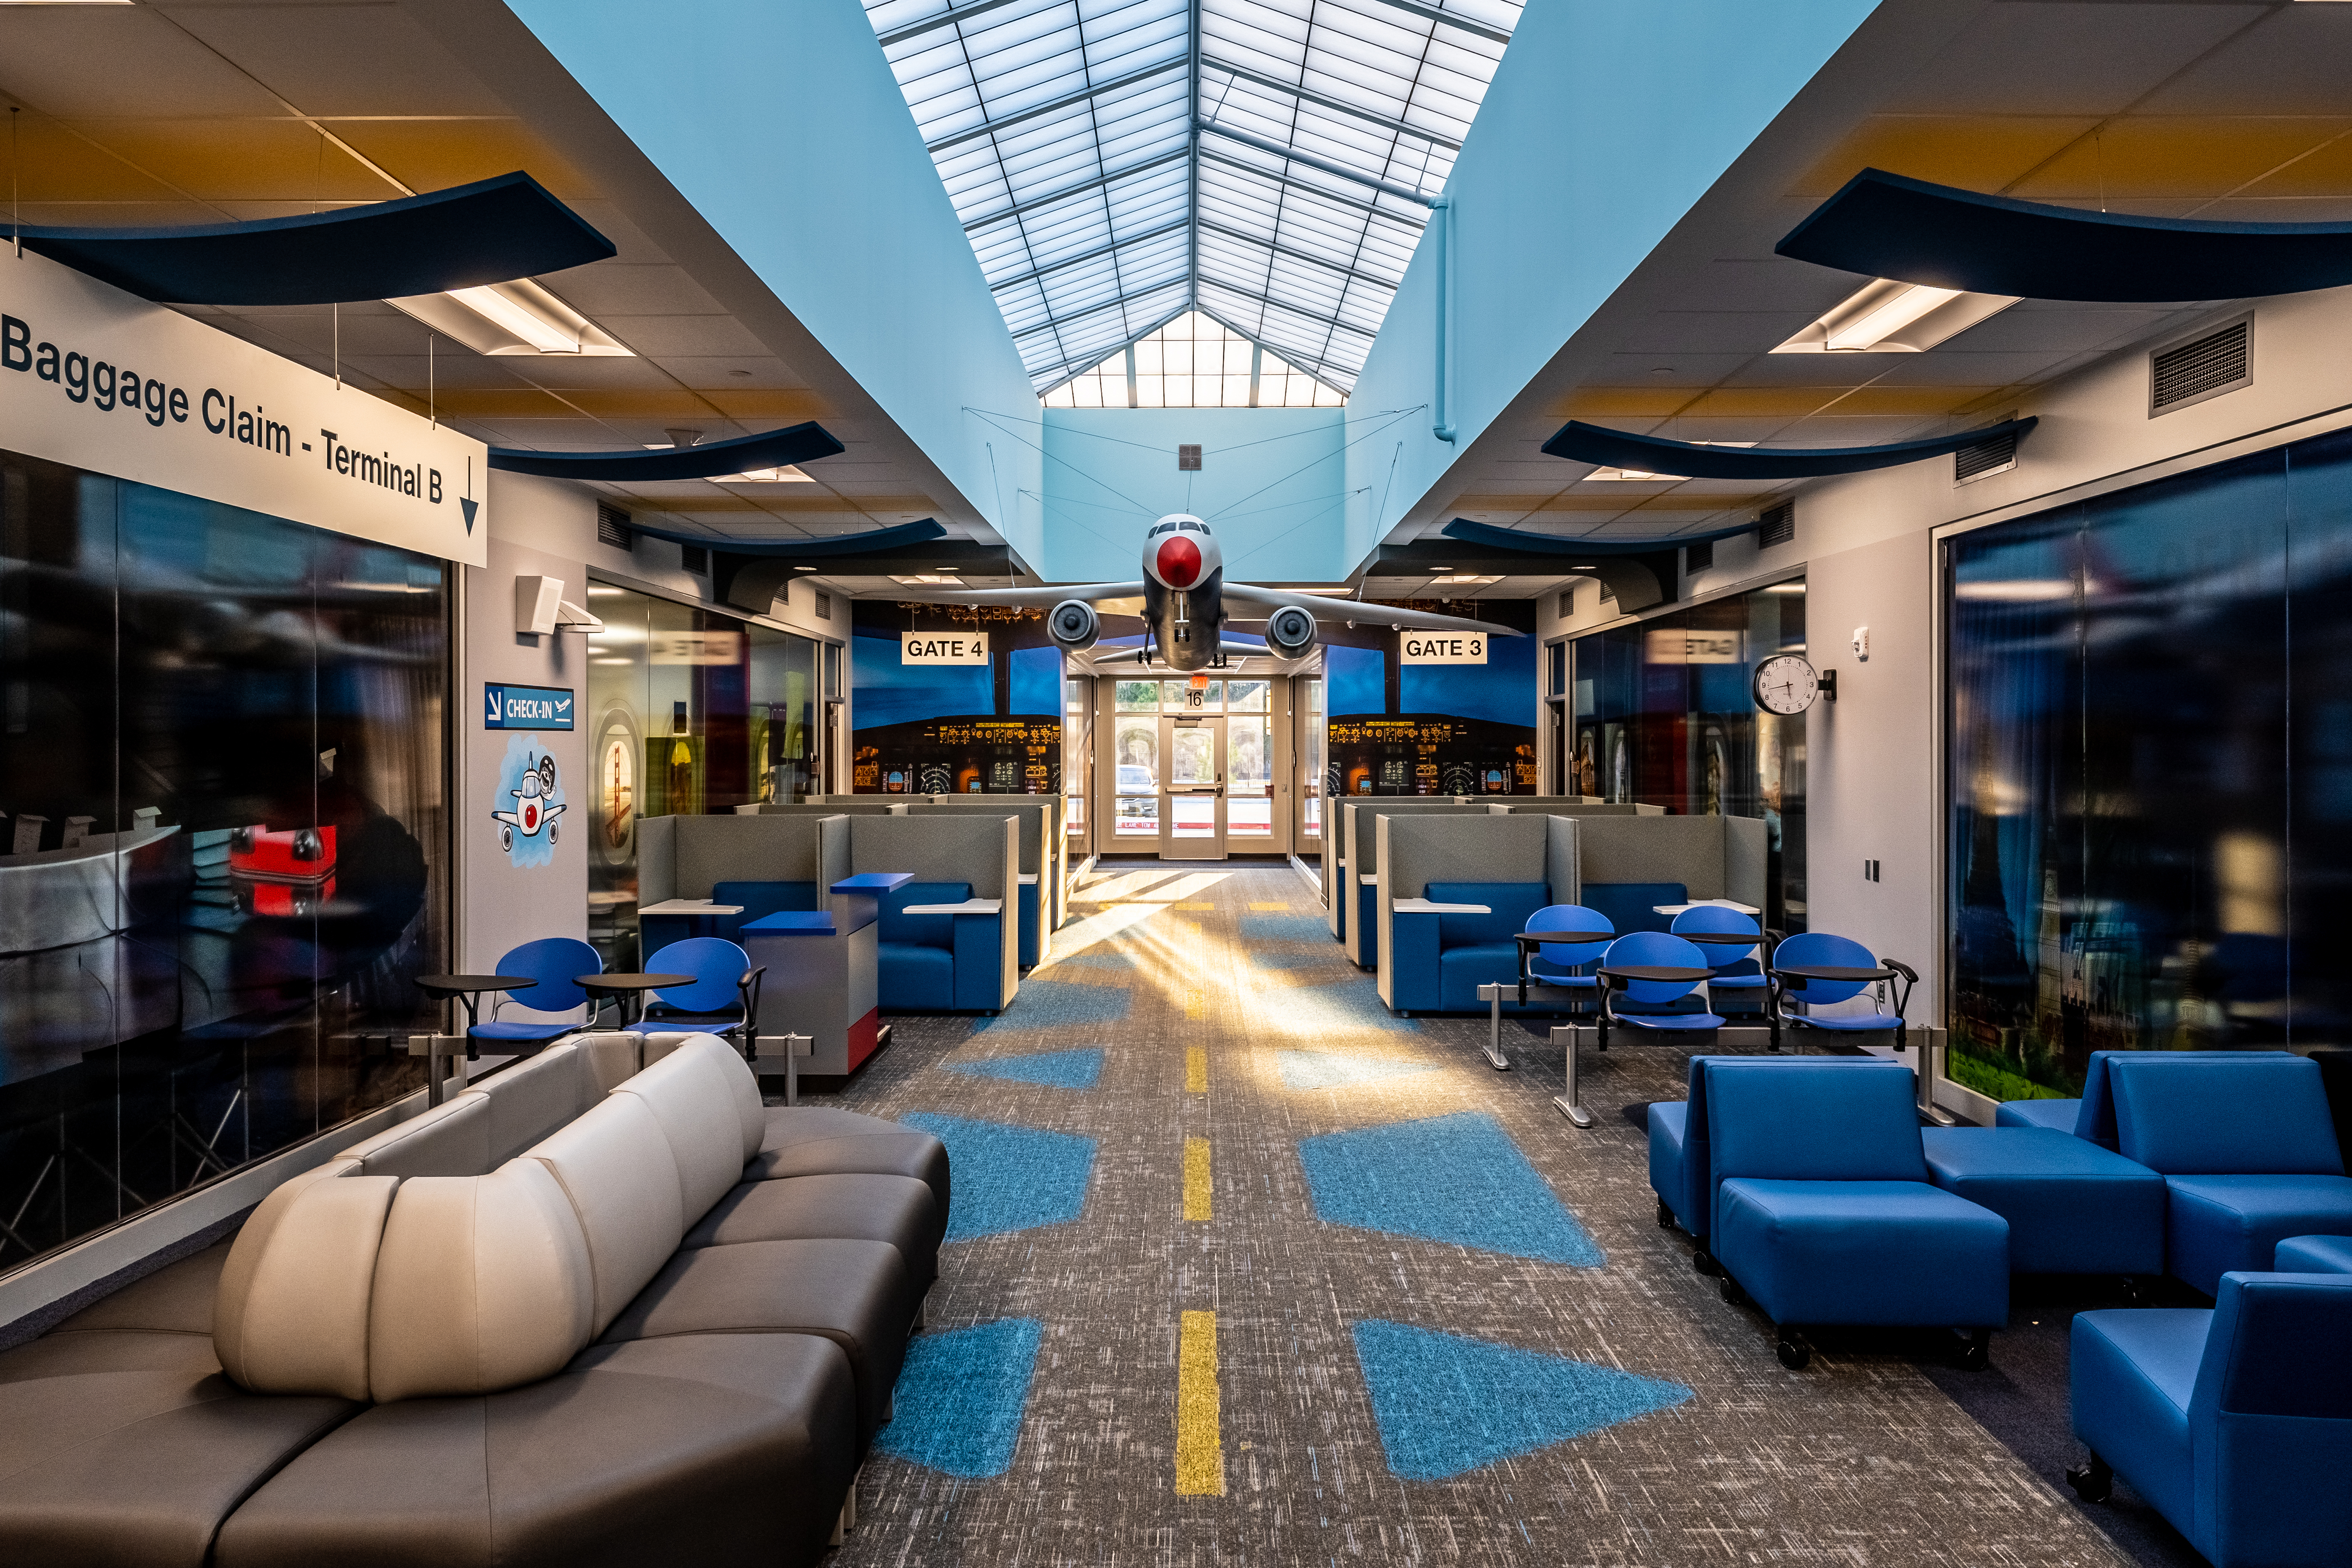 Play airport terminal